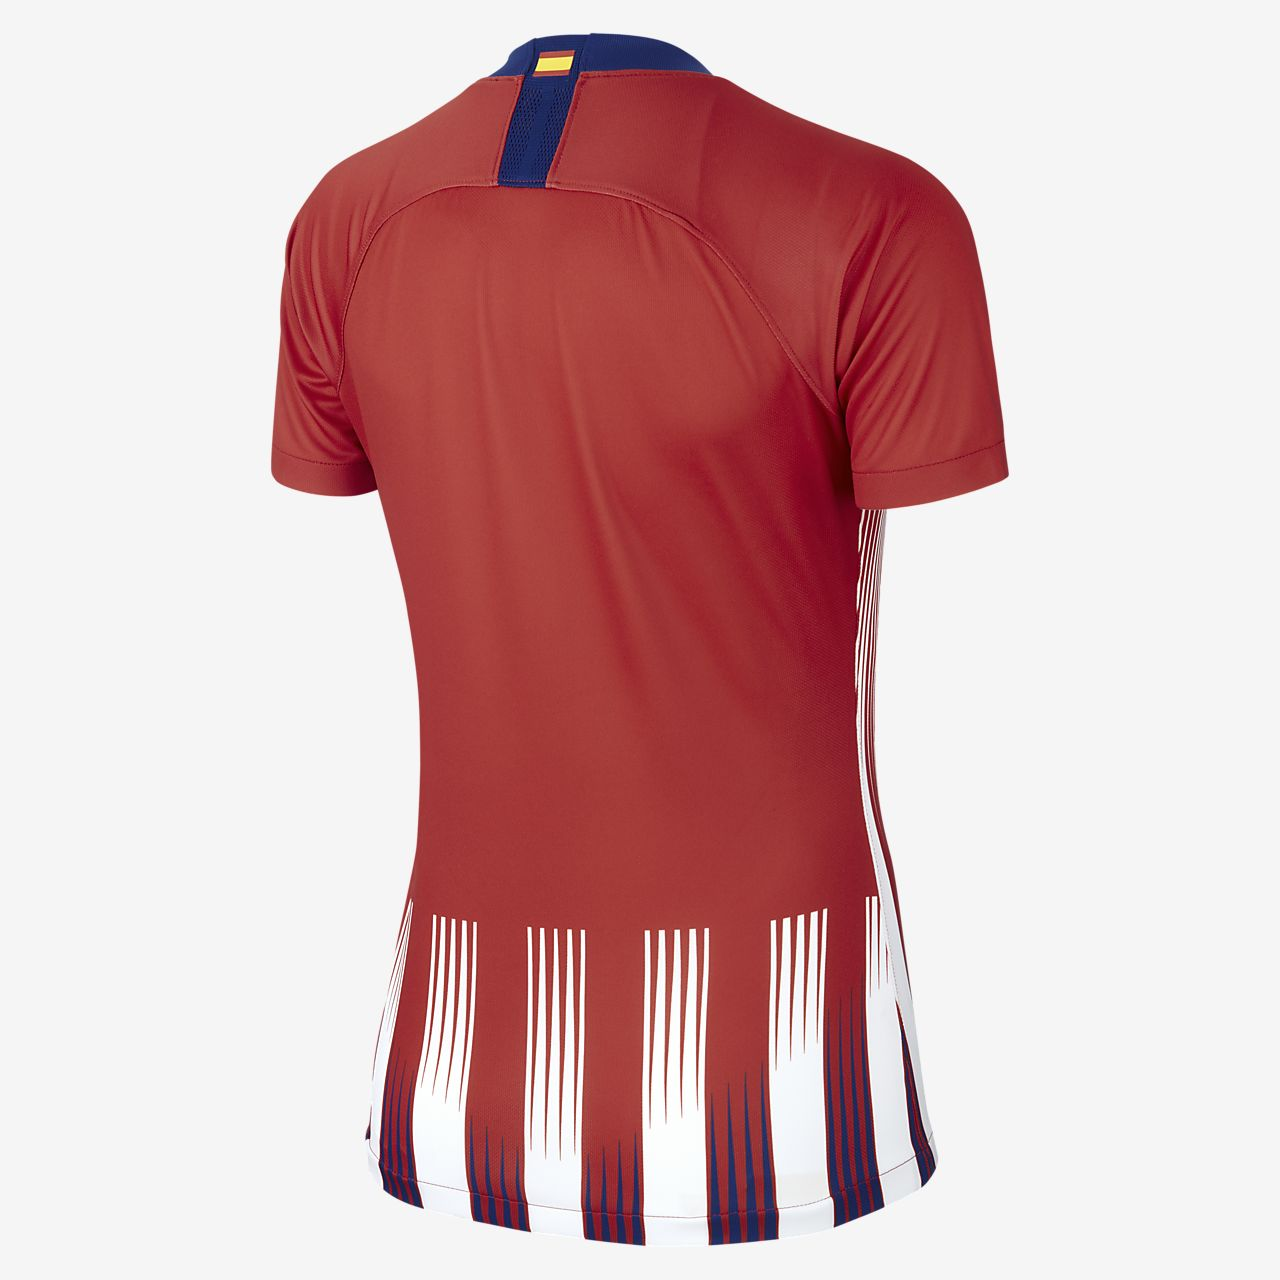 ... Camiseta de fútbol para mujer de local Stadium del Atlético de Madrid  2018 19 443c3c4e56249